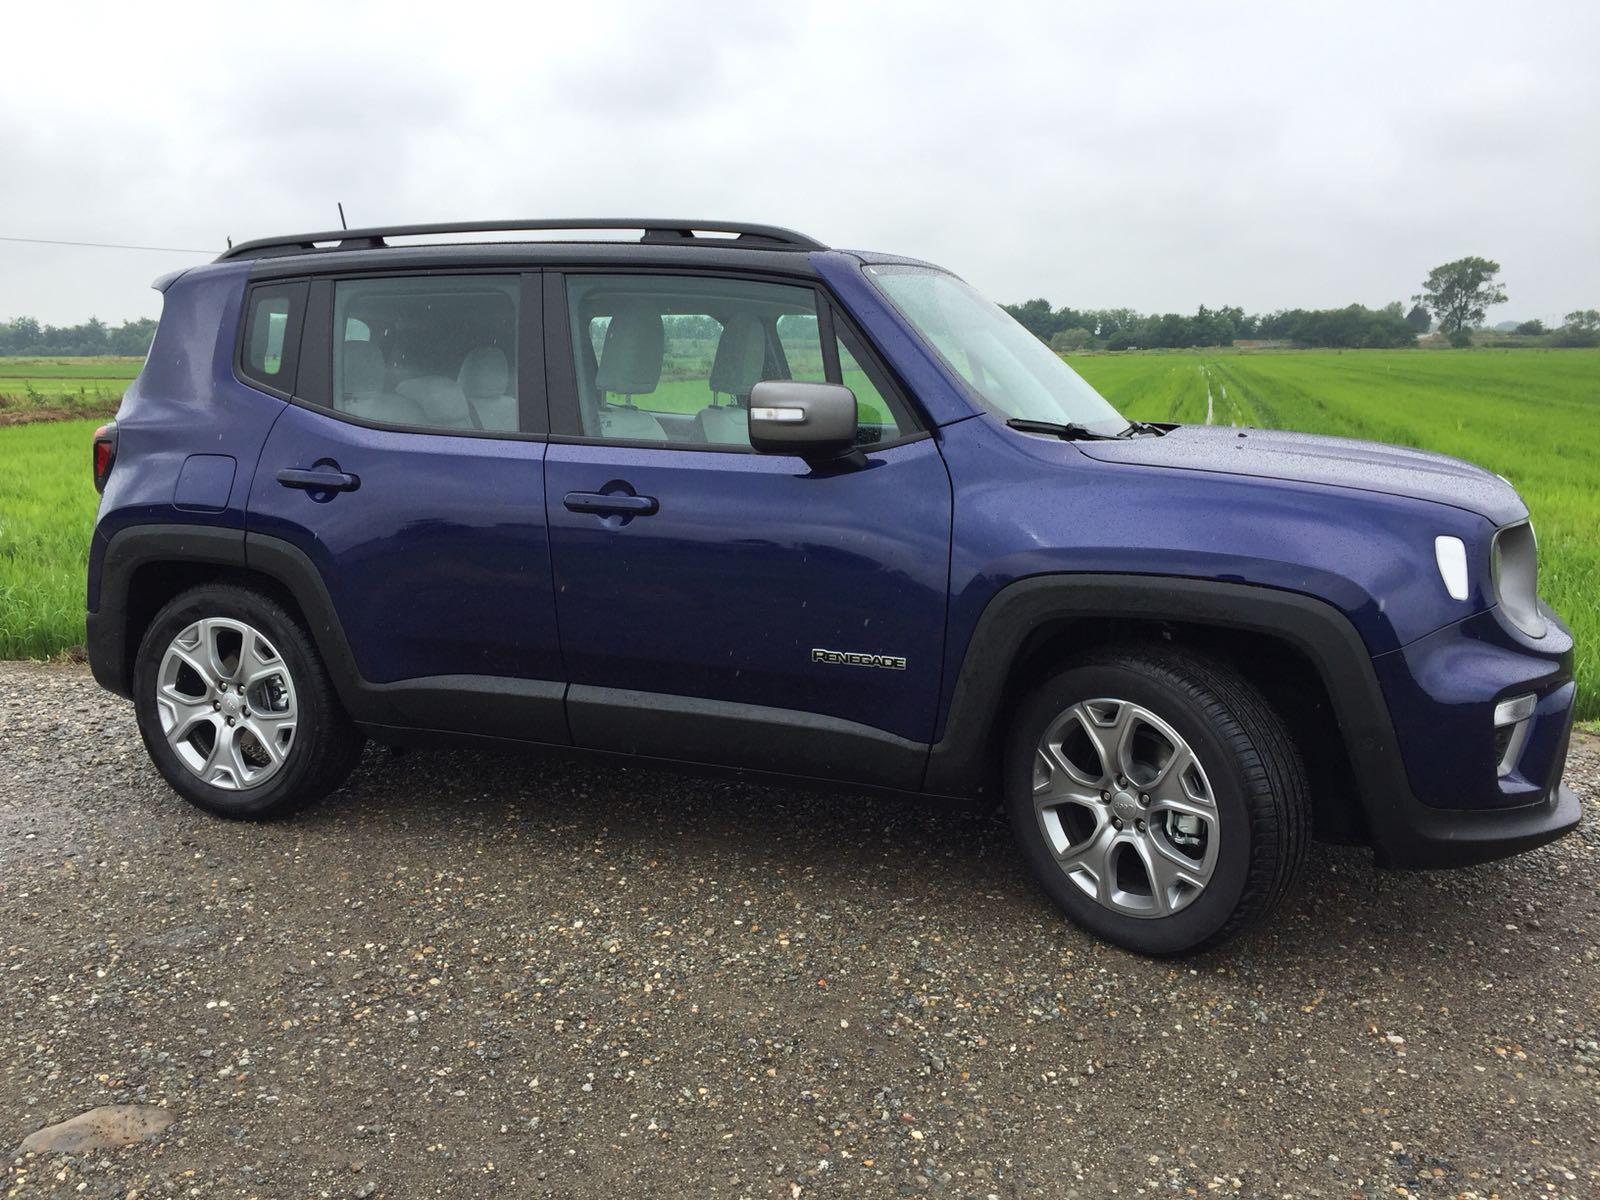 nuova-jeep-renegade-2019-esterni-linee-fuoristrada